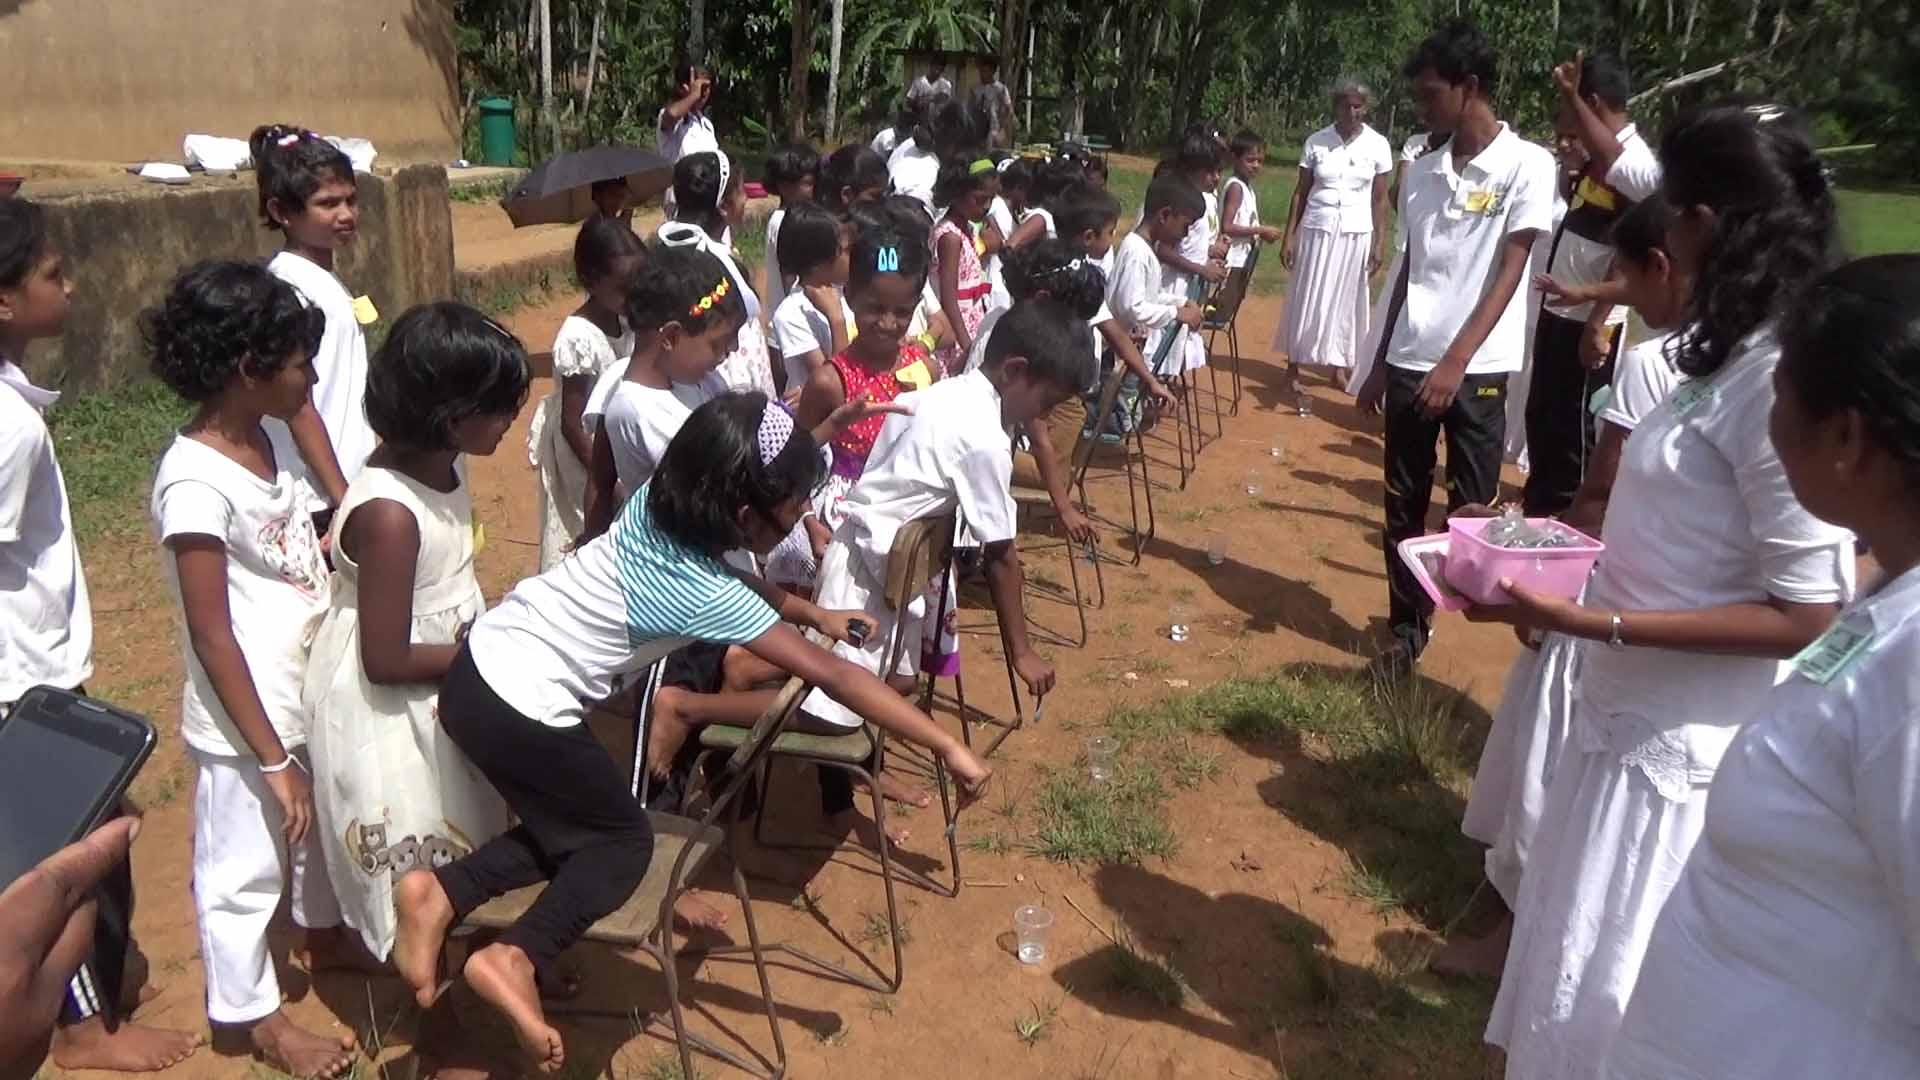 Sati Pasala Mindfulness Camp at Meethirigala Kanishta Vidyalaya-mindful games (9)